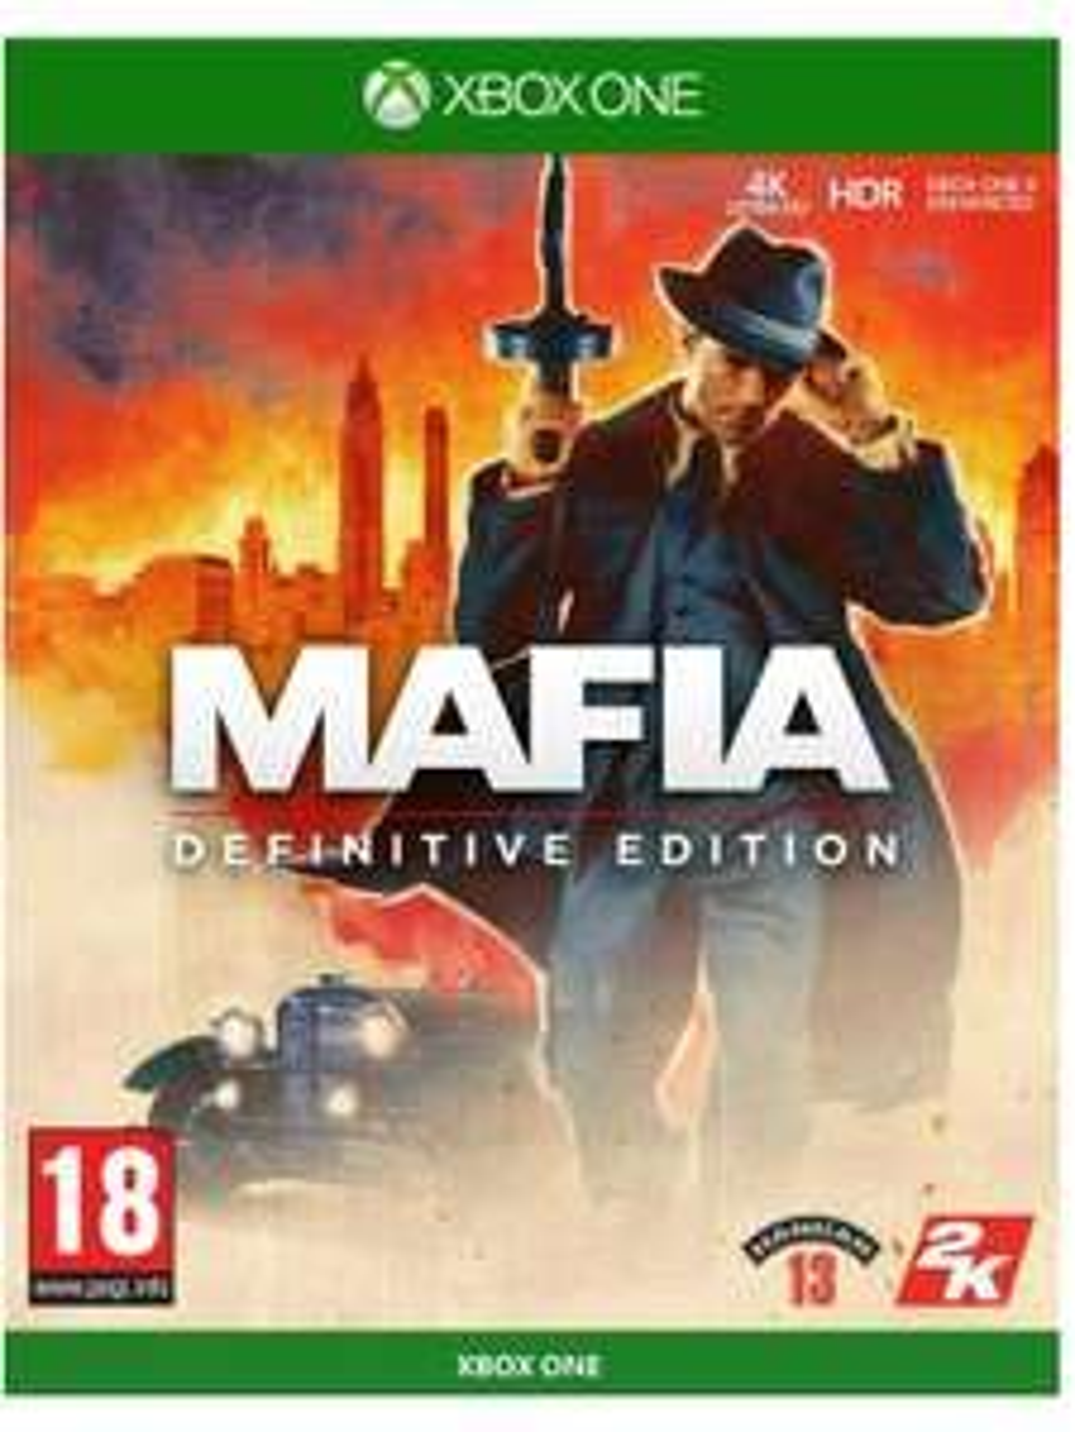 Mafia Definitive Edition Xbox One (NL versie)